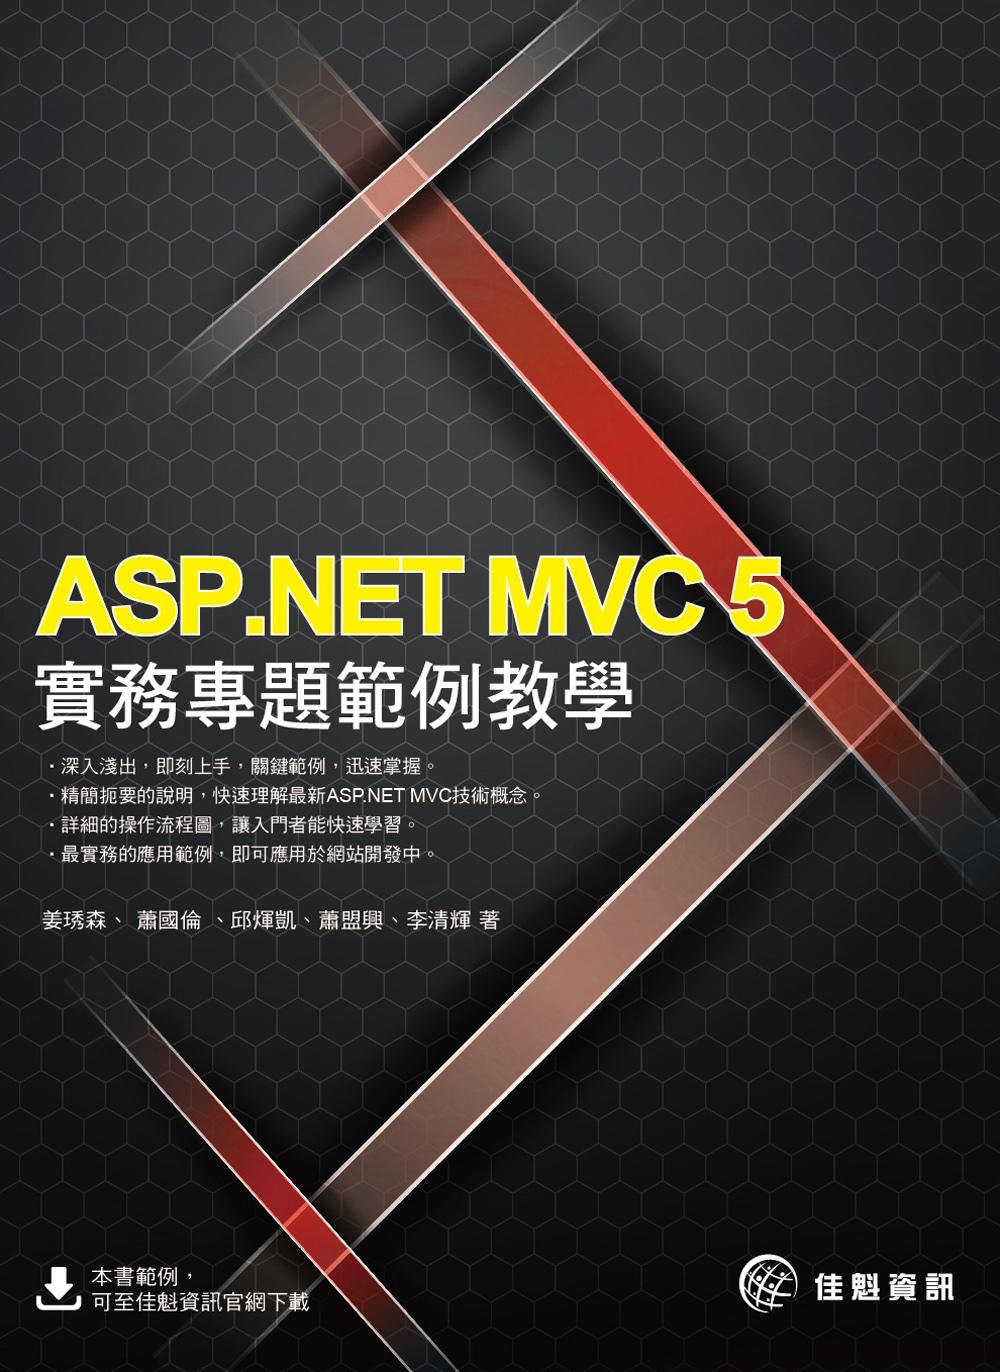 ASP.NET MVC 5實務專題範例教學